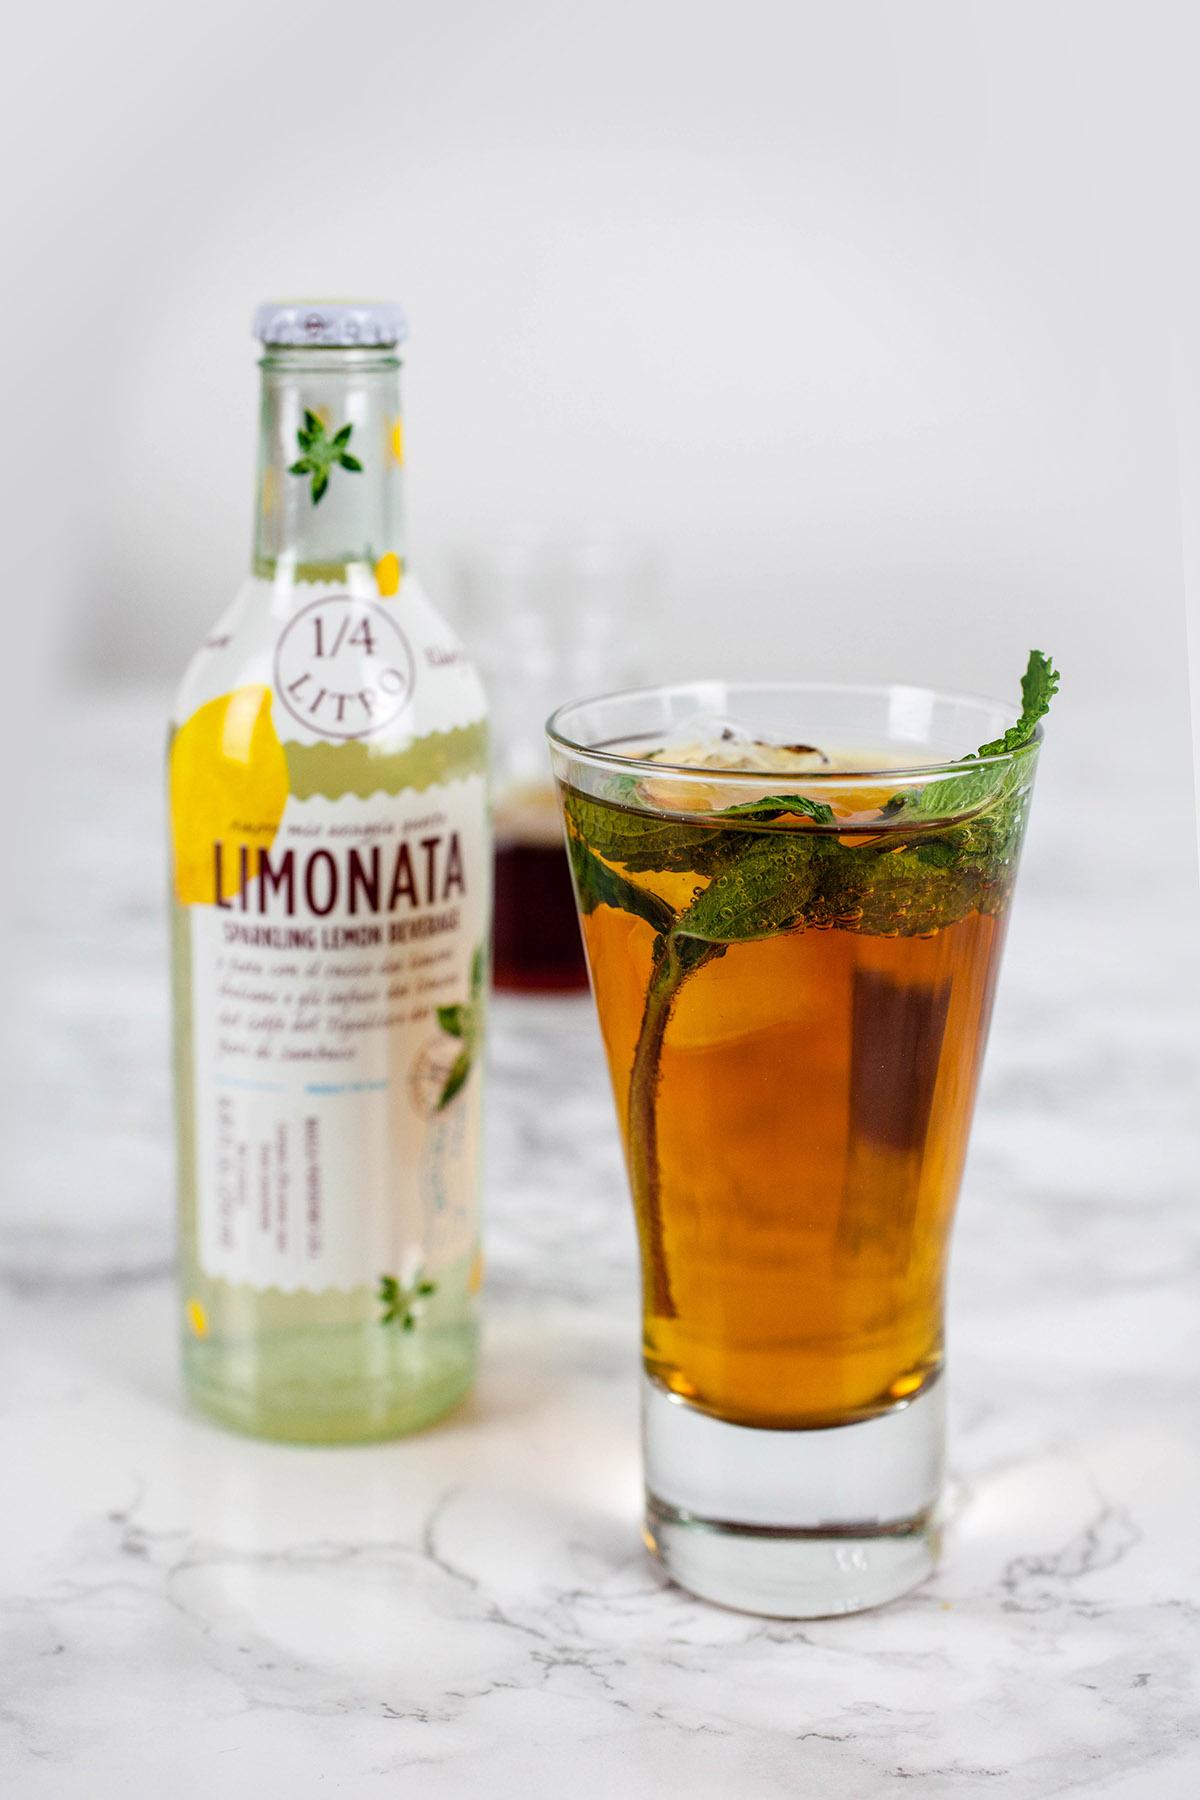 Italian Lemonade and Iced Tea